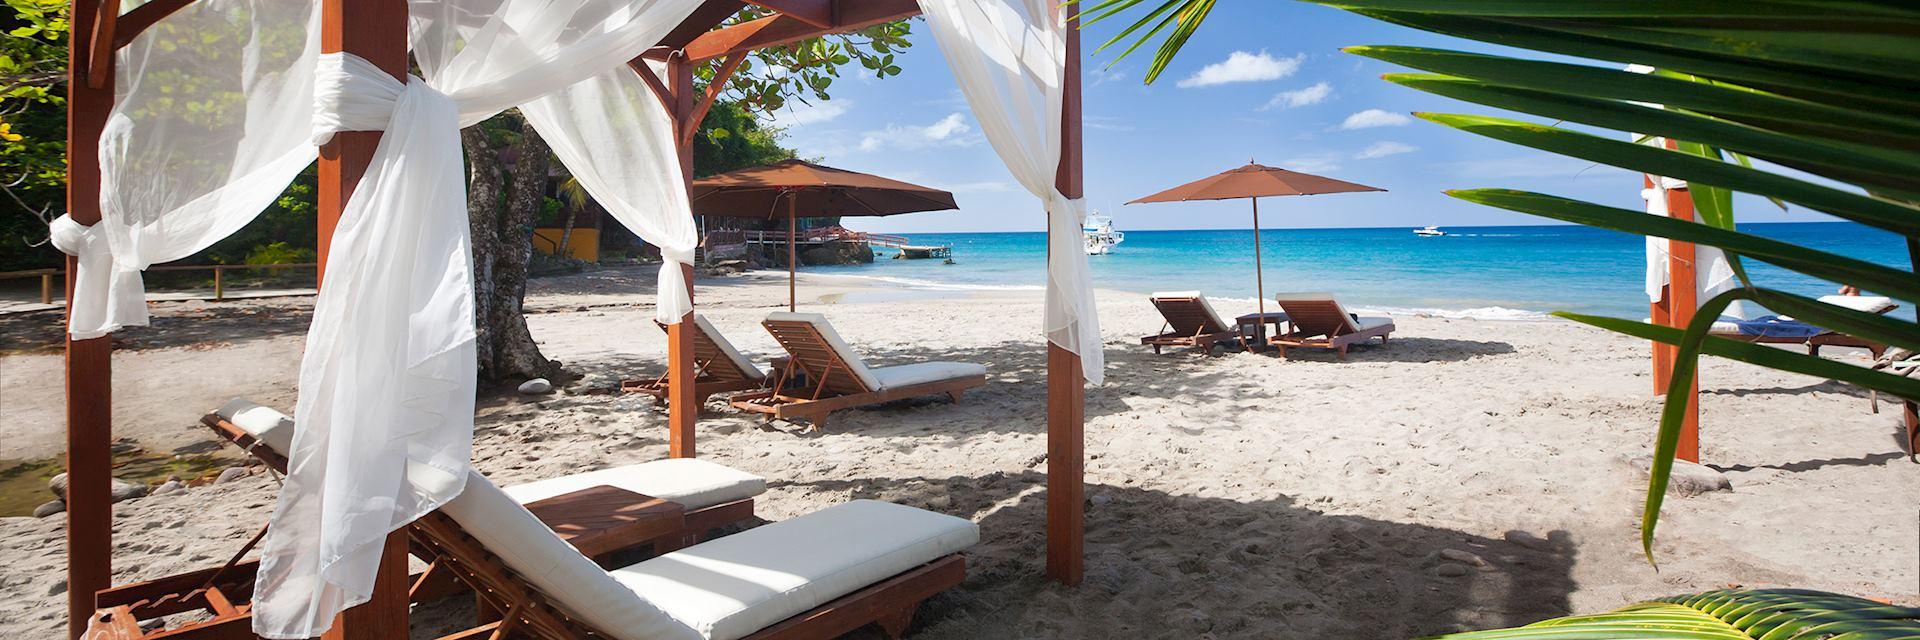 Ti Kaye Resort and Spa, Saint Lucia